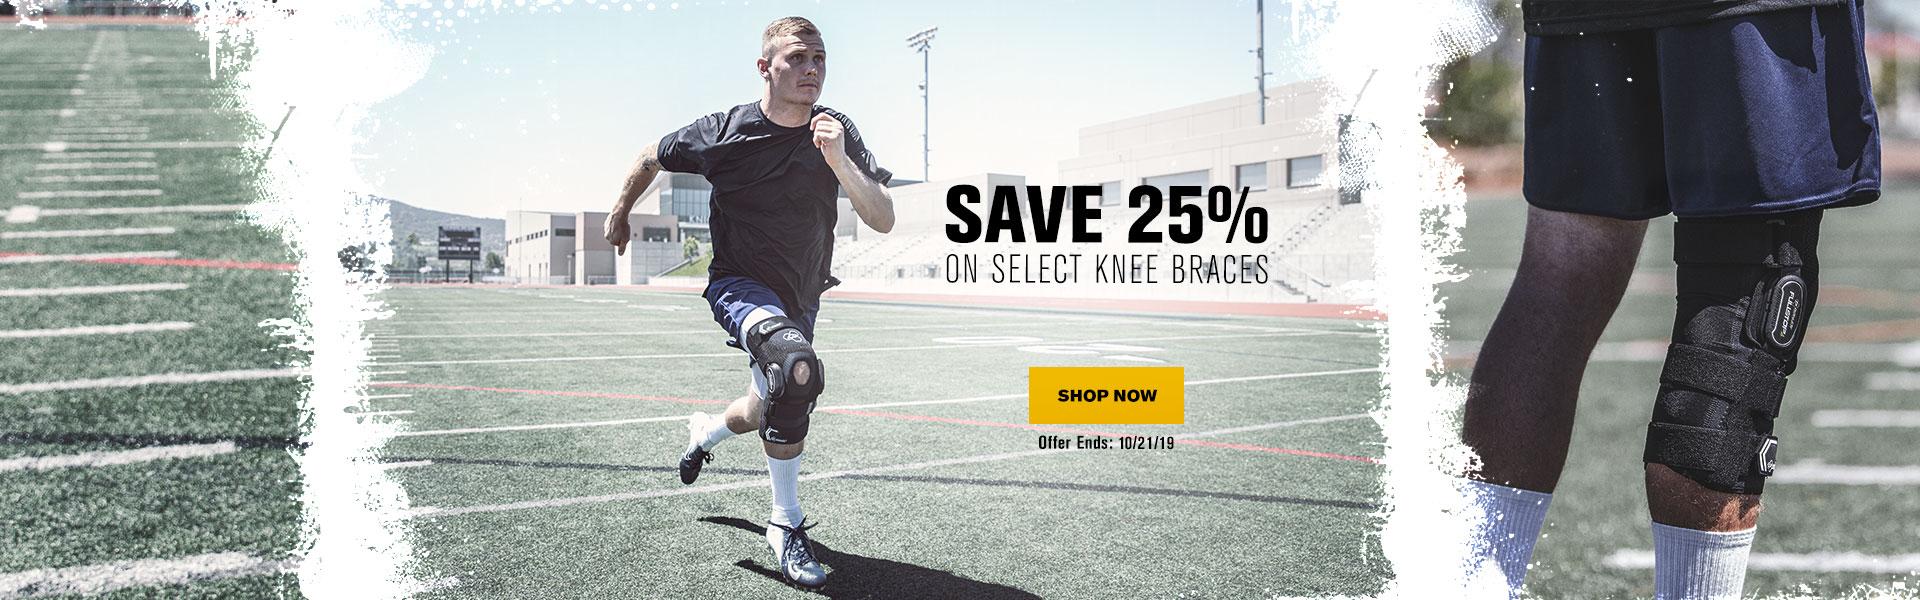 Save 25% On Select Knee Braces